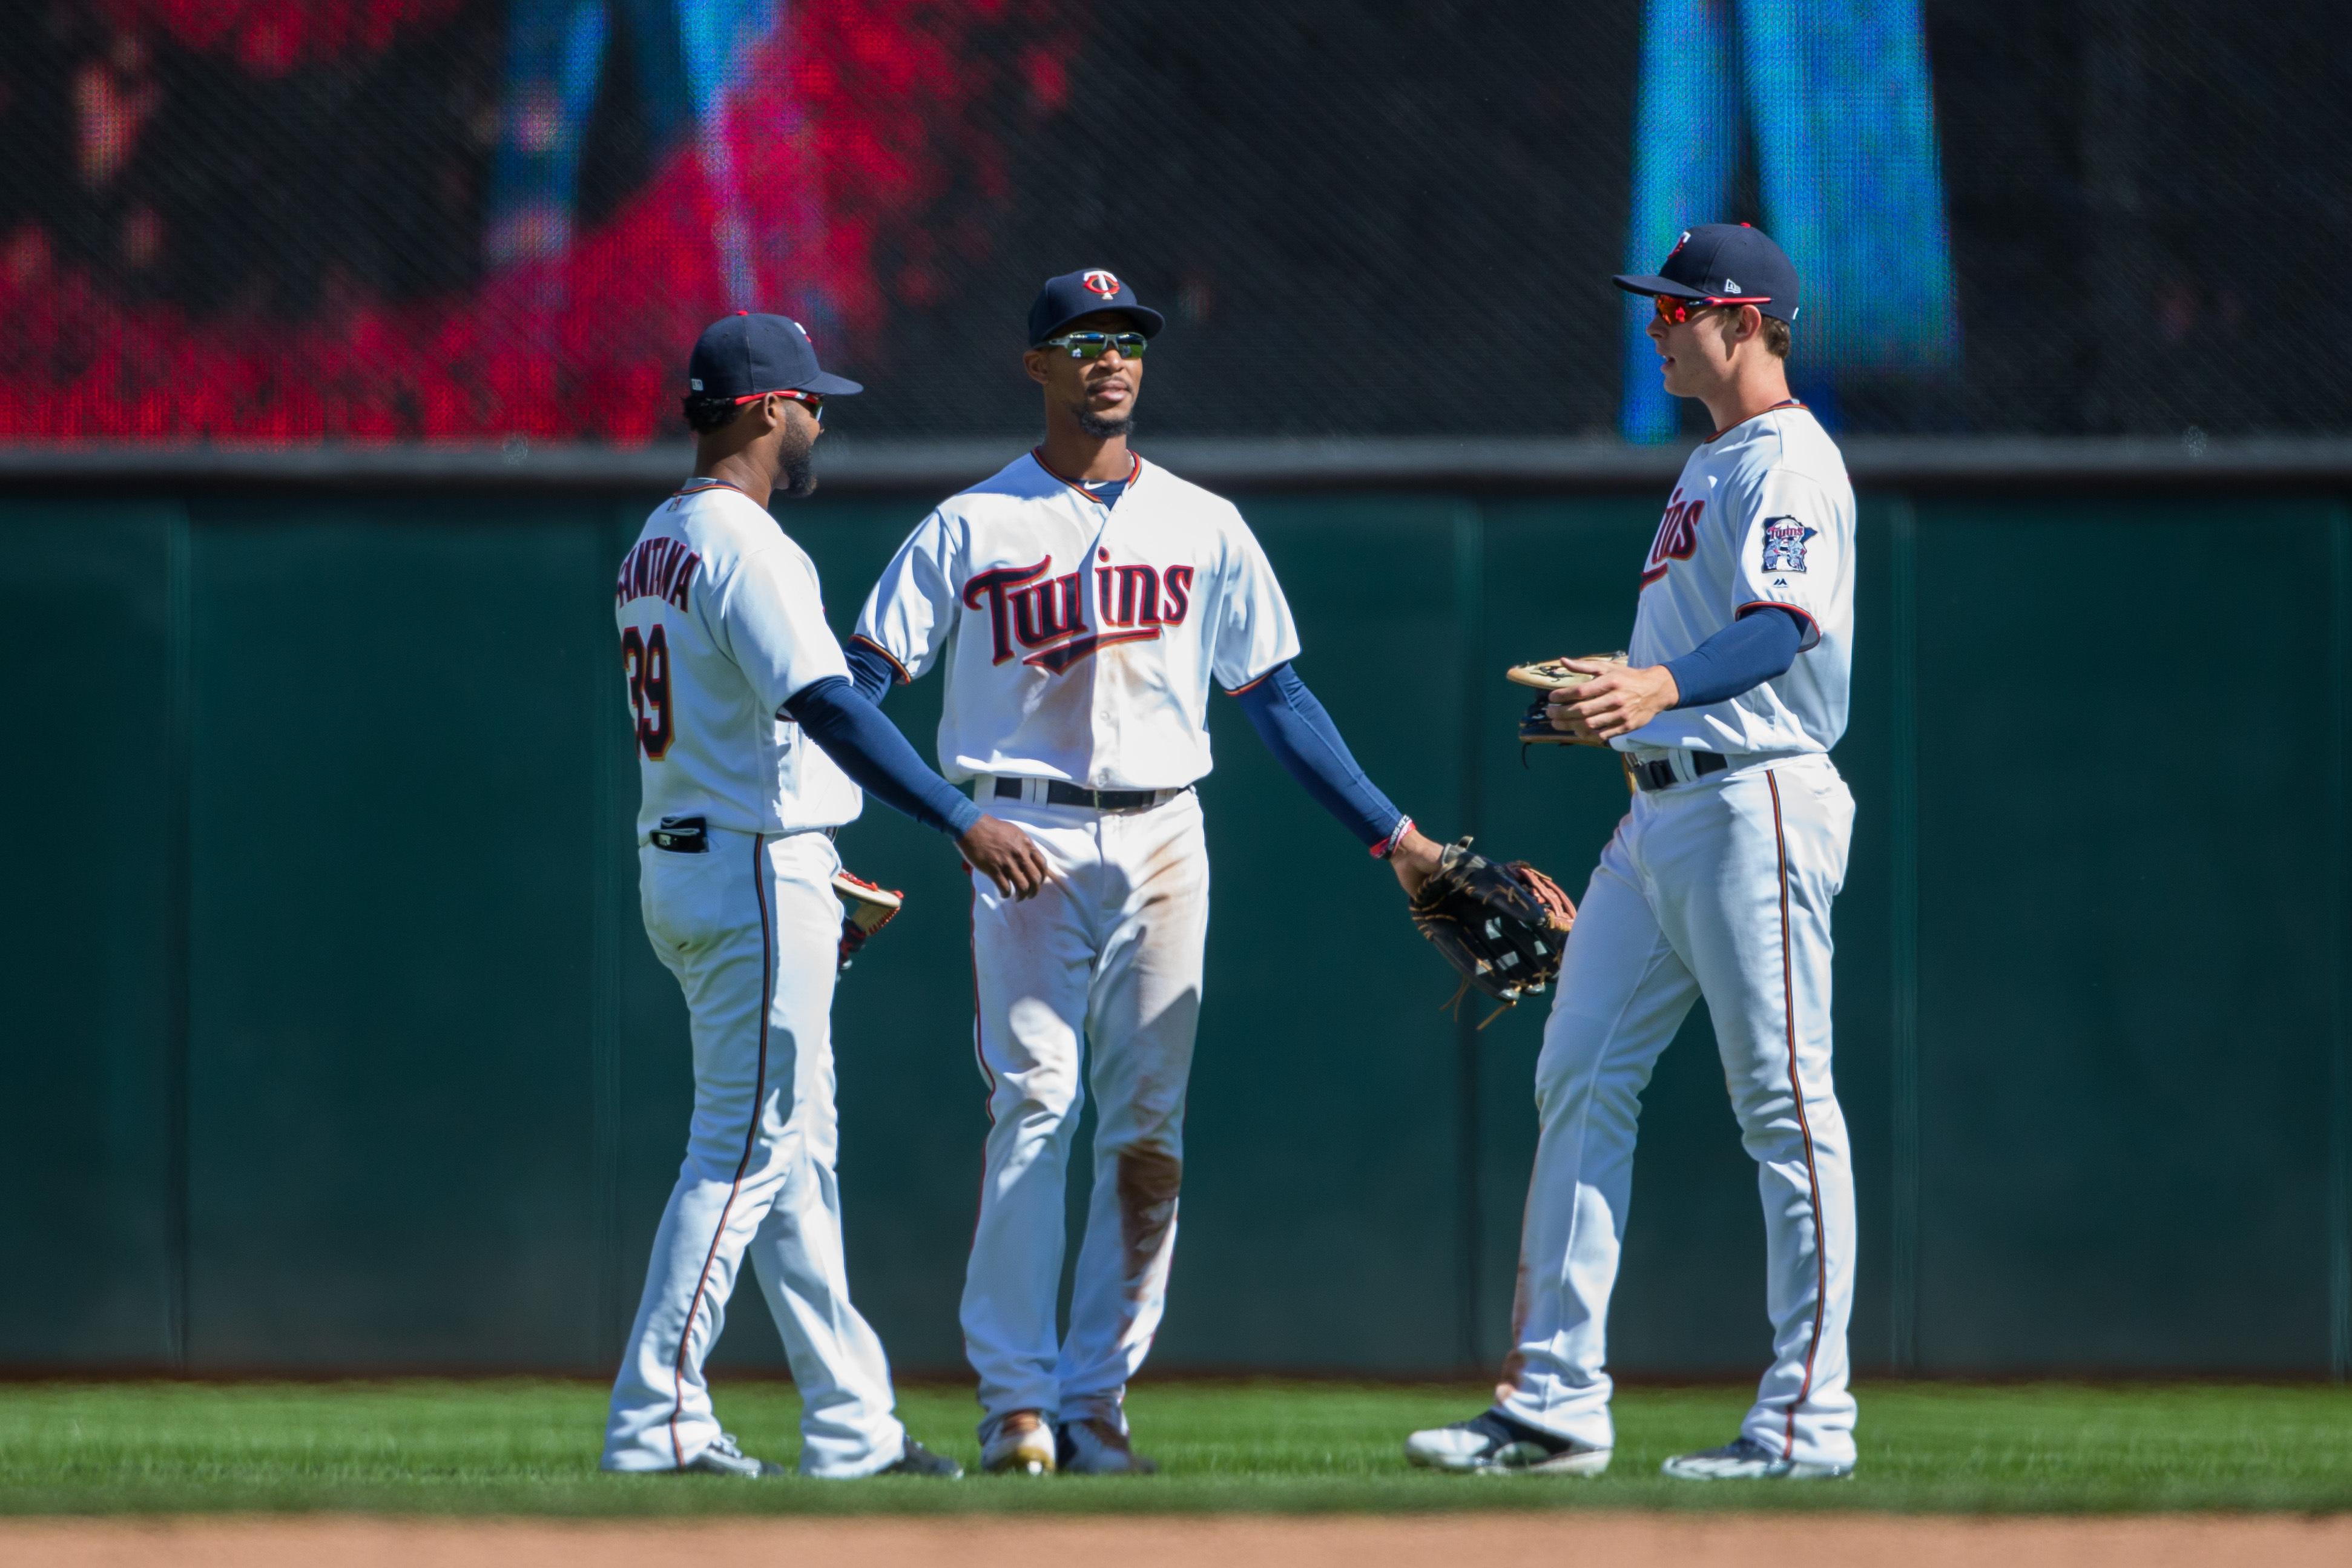 MLB: Kansas City Royals at Minnesota Twins